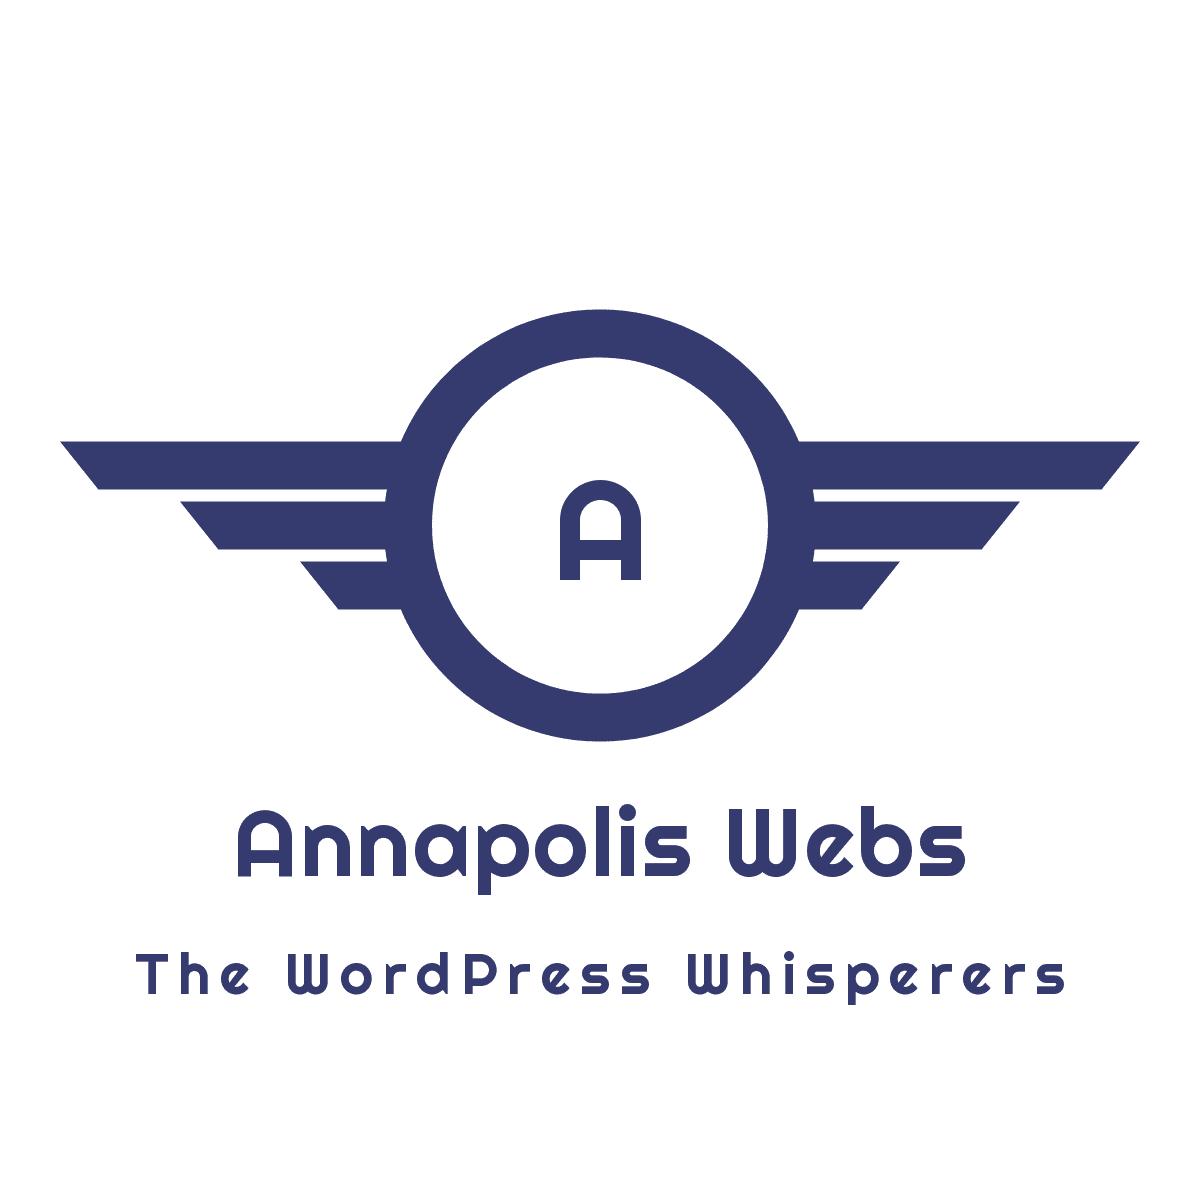 AnnapolisWebs.com